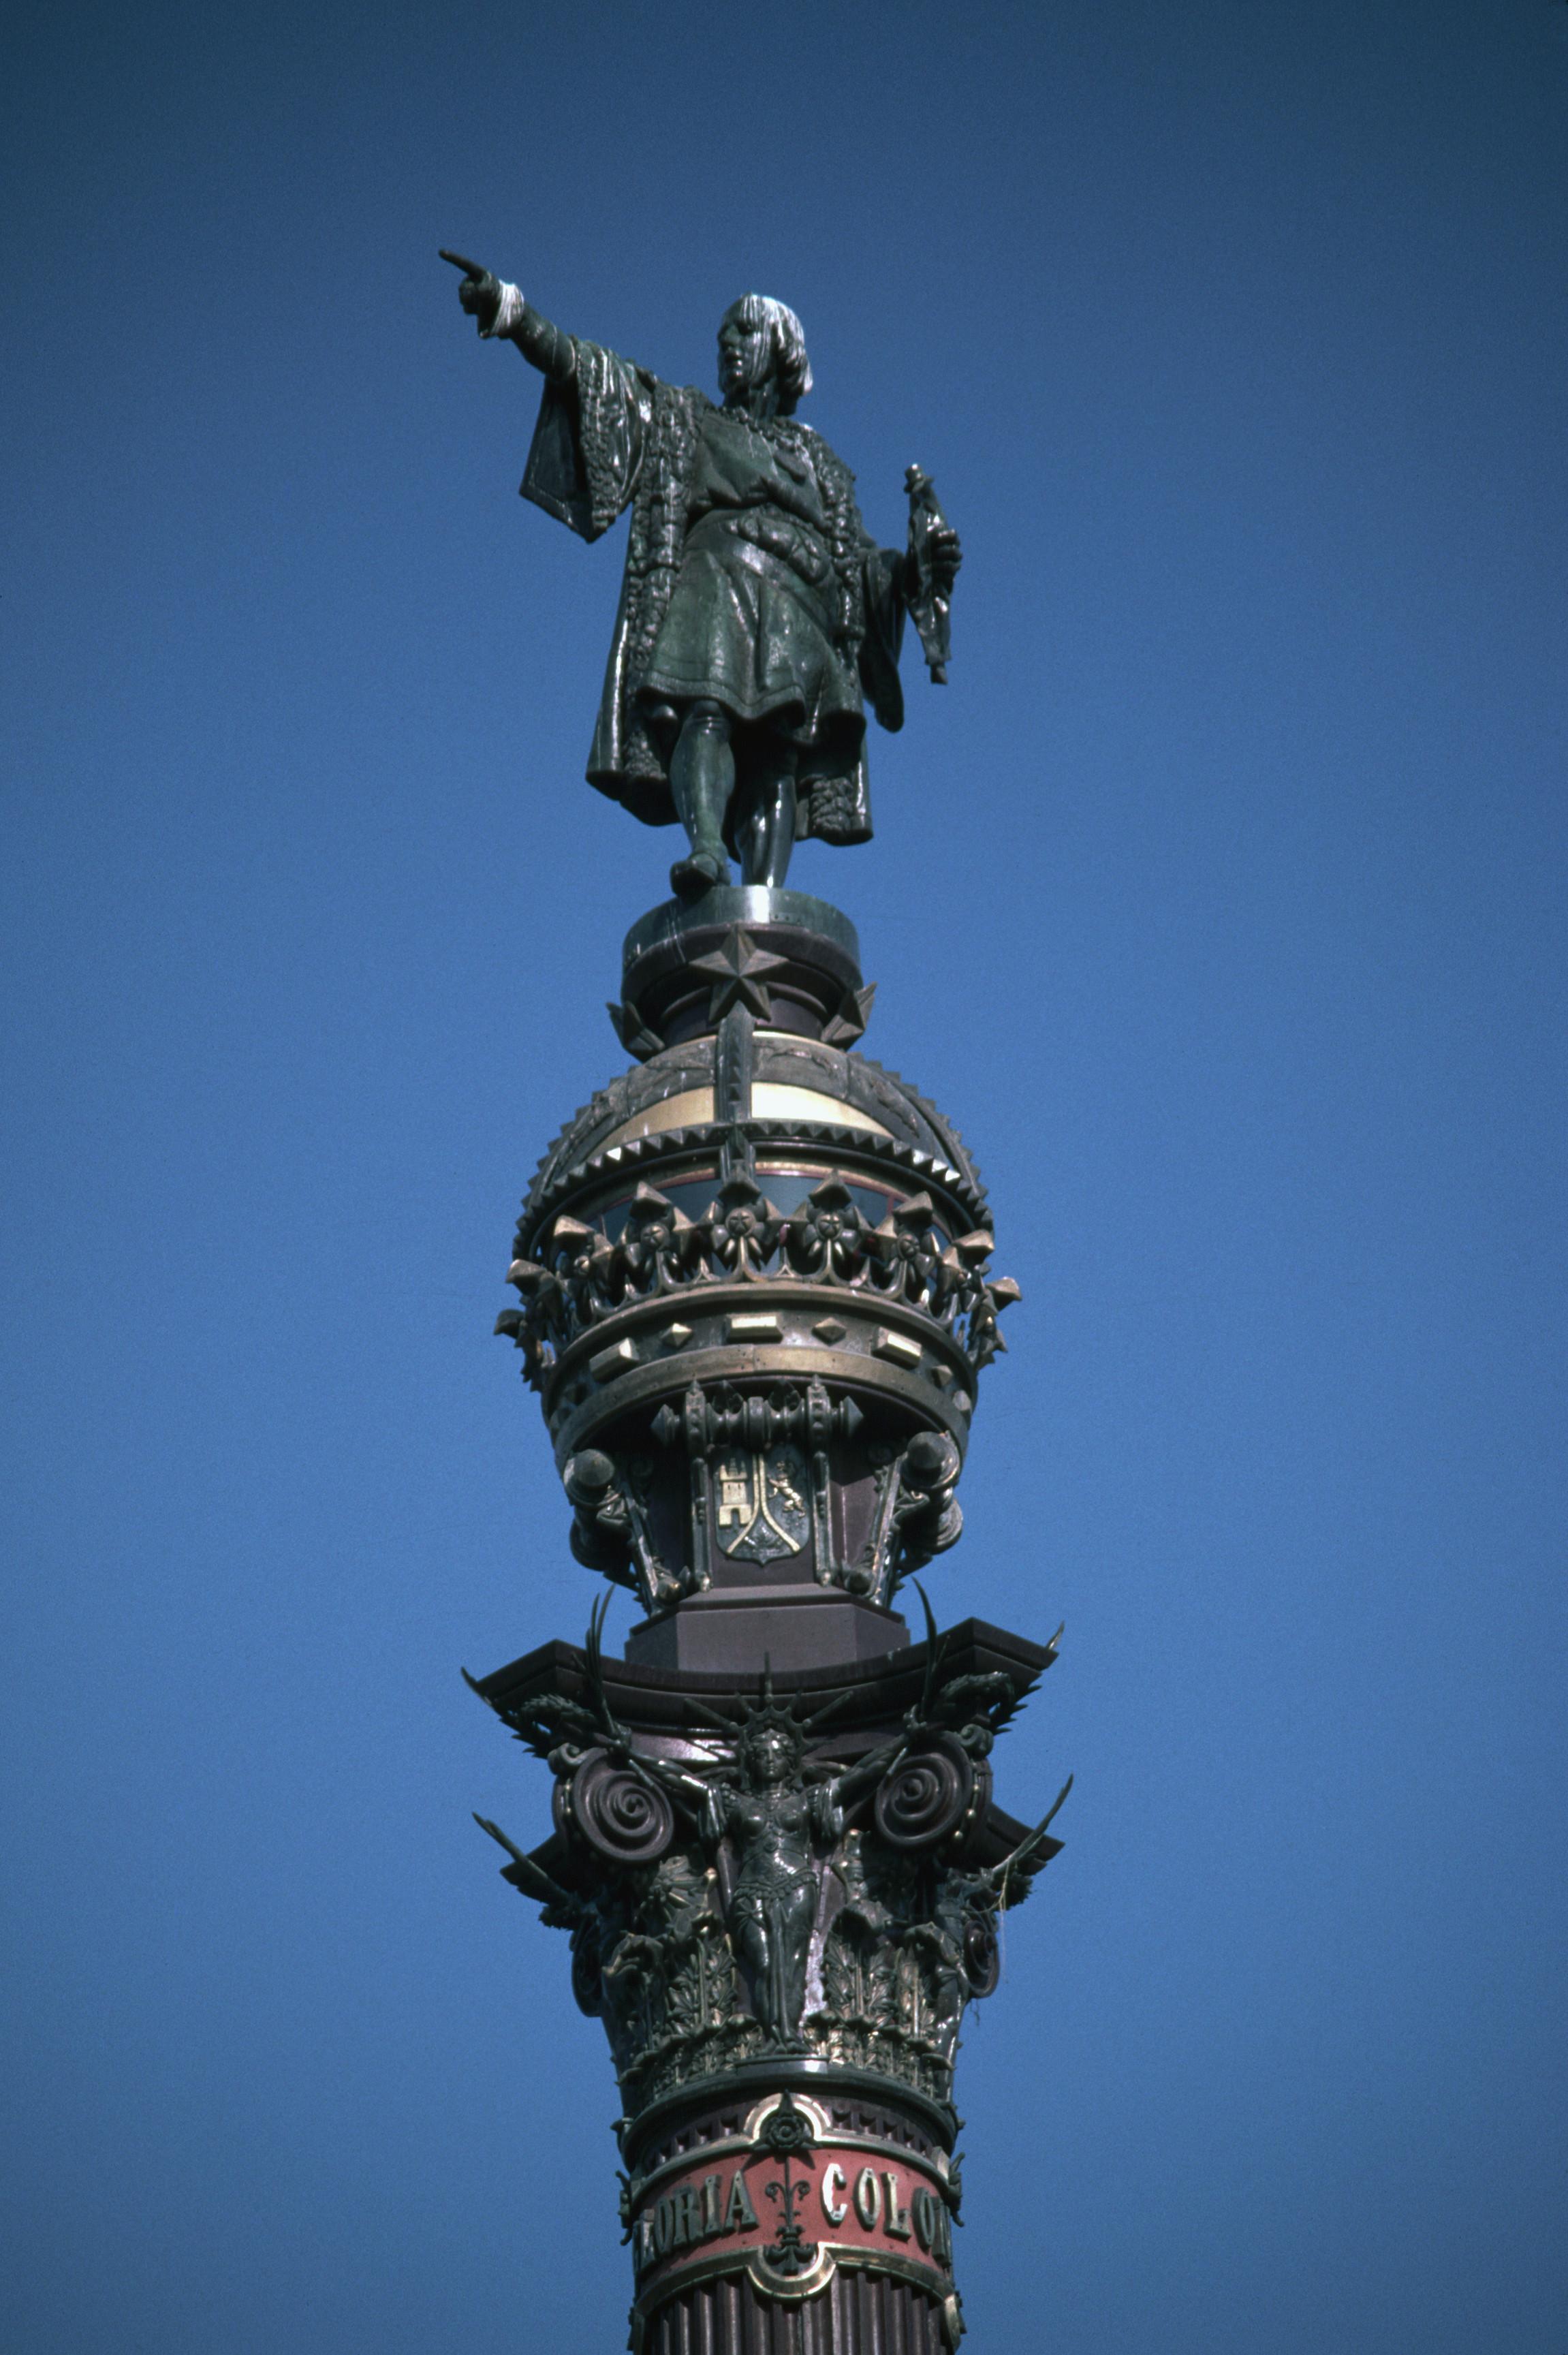 engraving of christopher columbus standing on his ship columbus